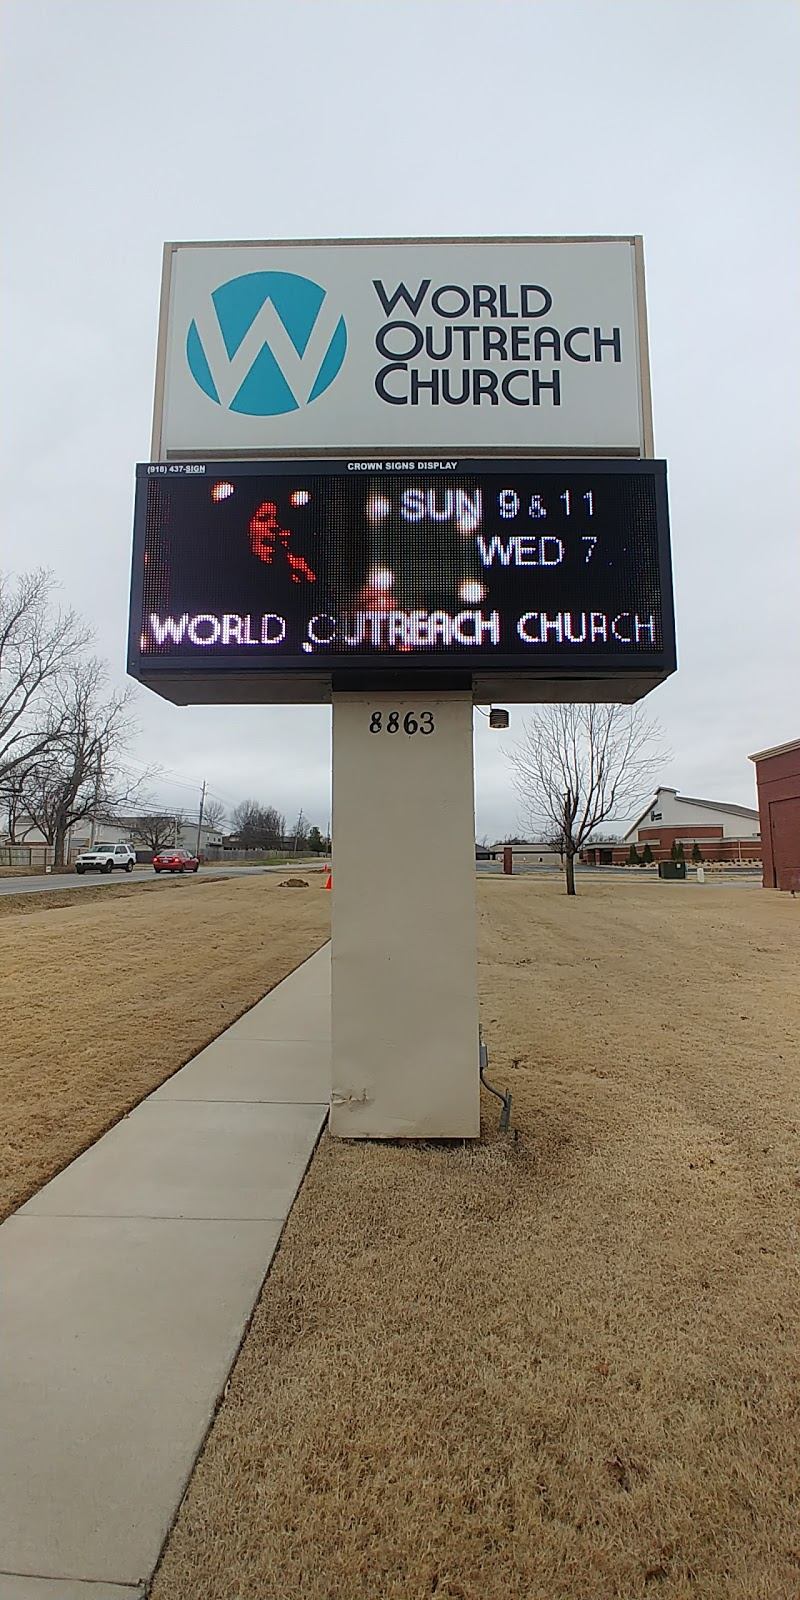 World Outreach Church Of Tulsa - church    Photo 8 of 10   Address: 8863 E 91st St, Tulsa, OK 74133, USA   Phone: (918) 461-9628